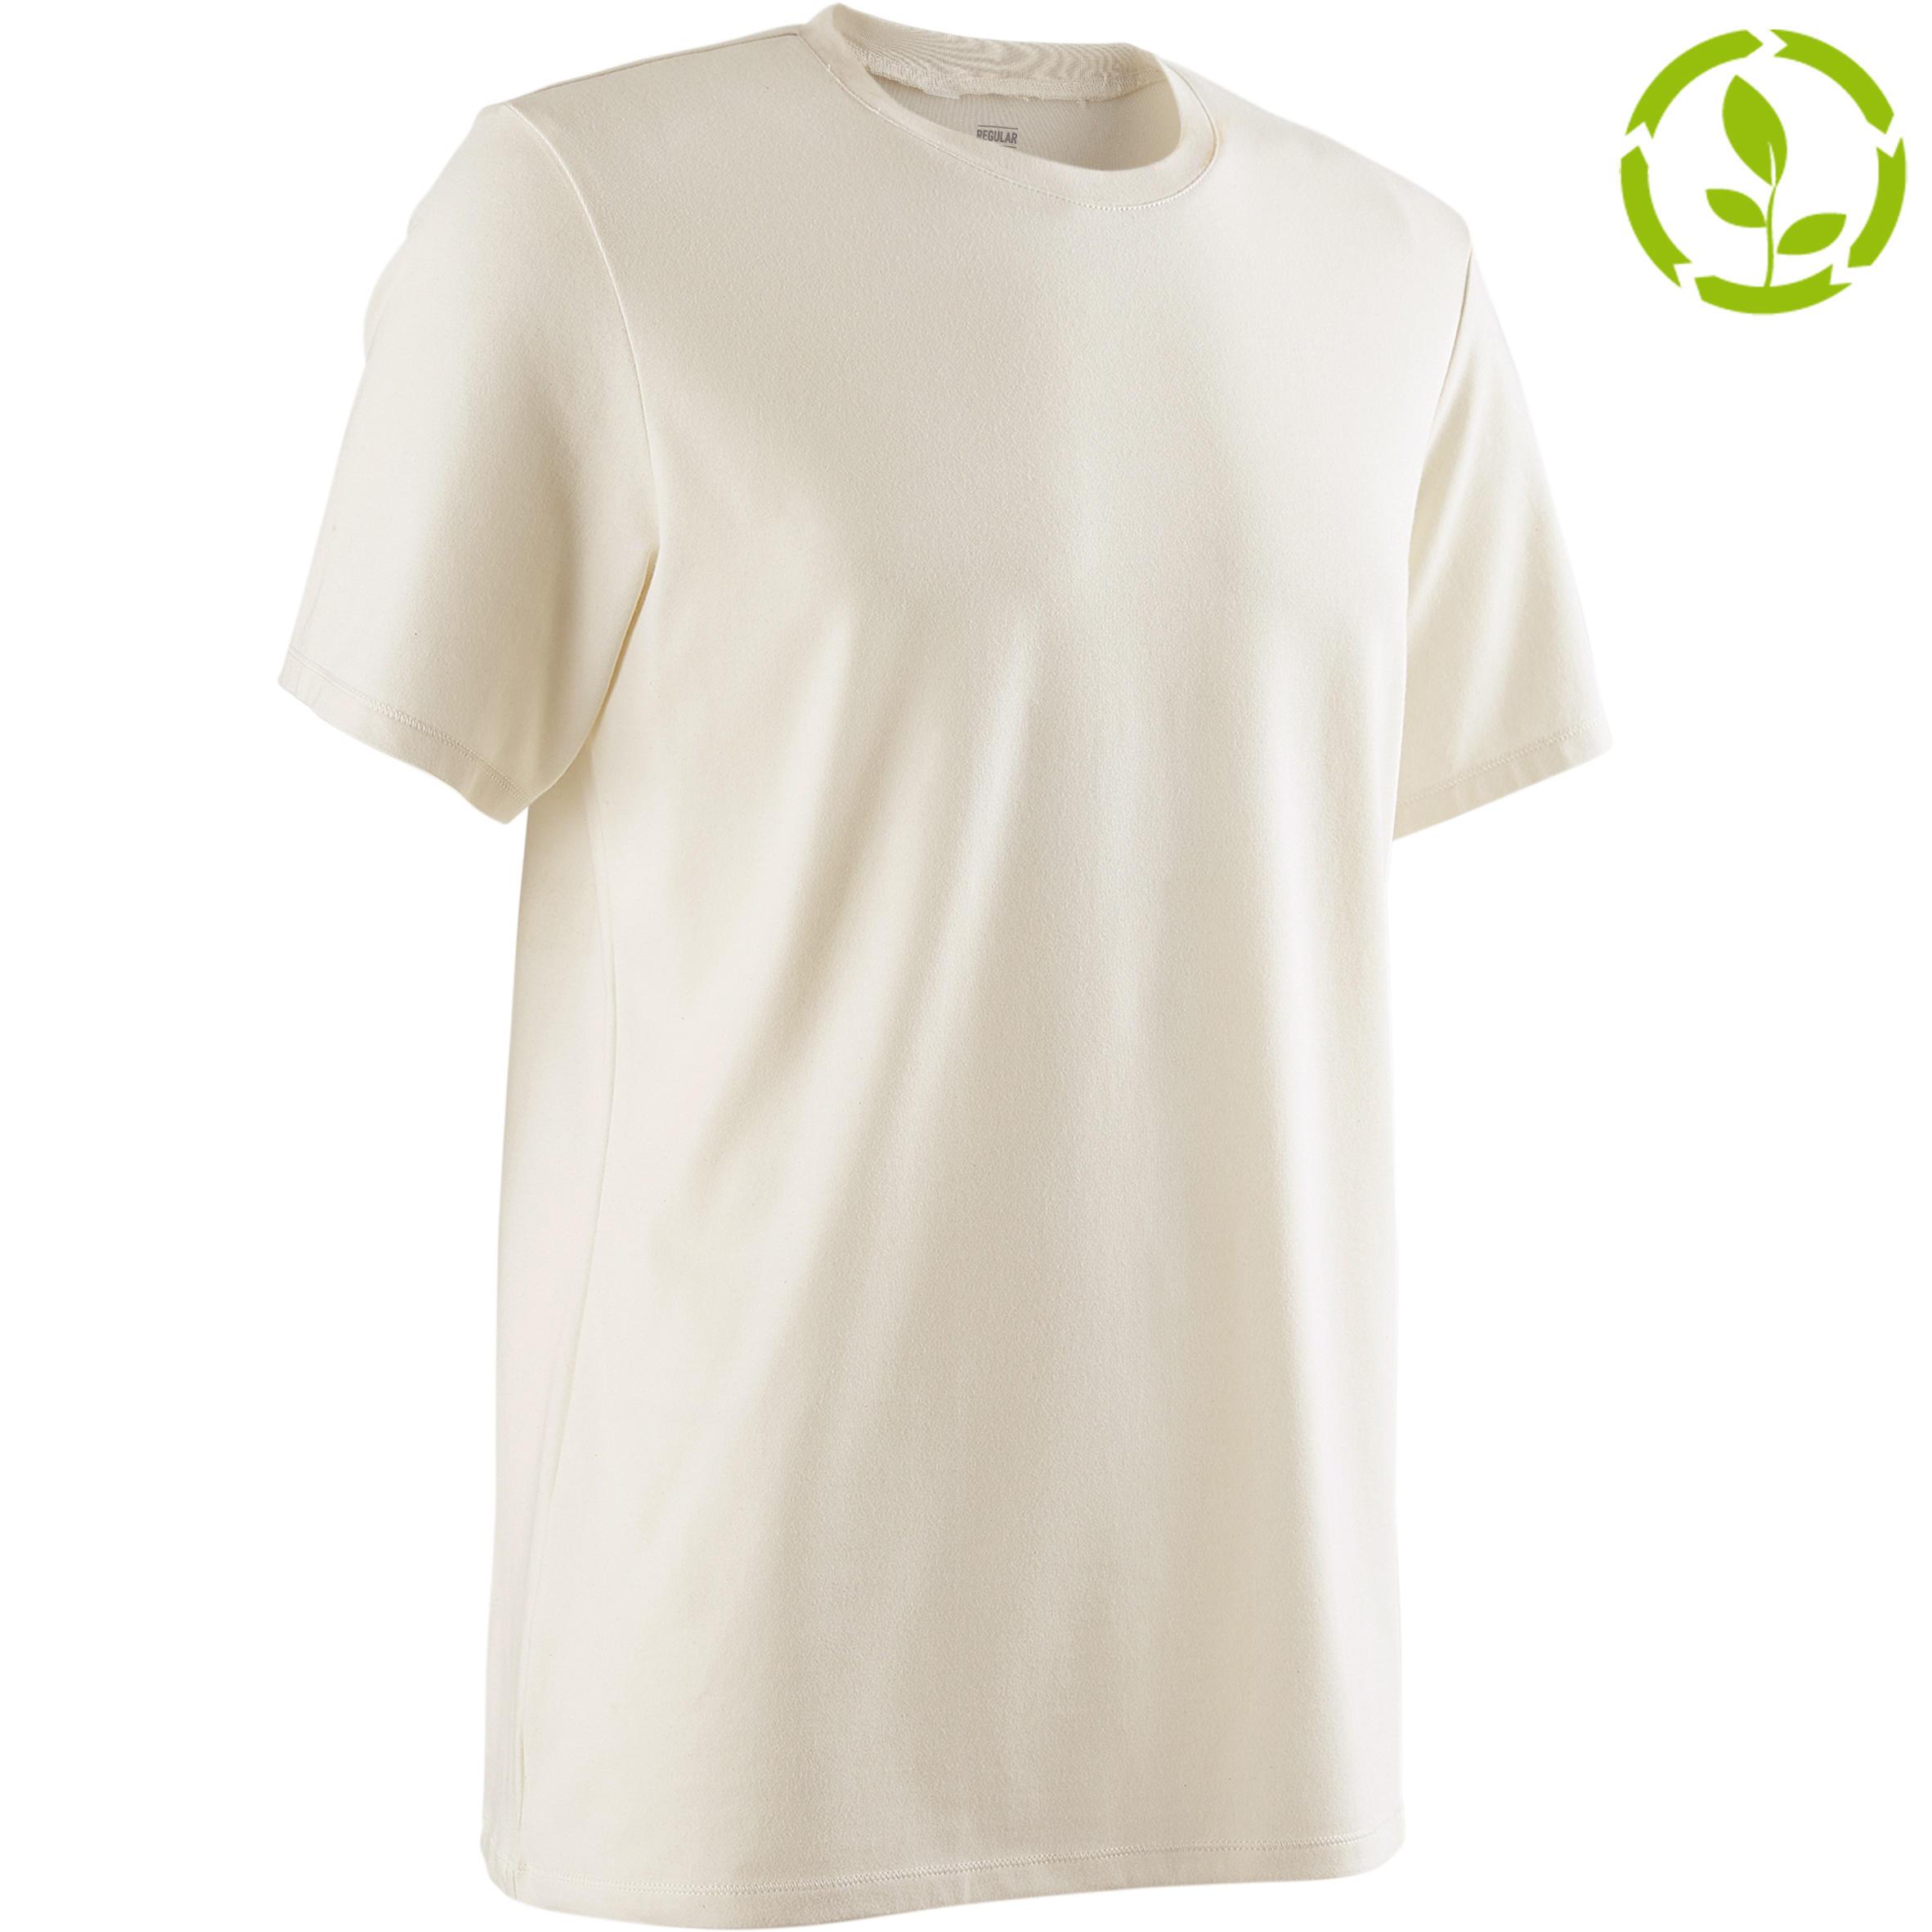 Domyos T-shirt 500 regular fit gym en stretching heren